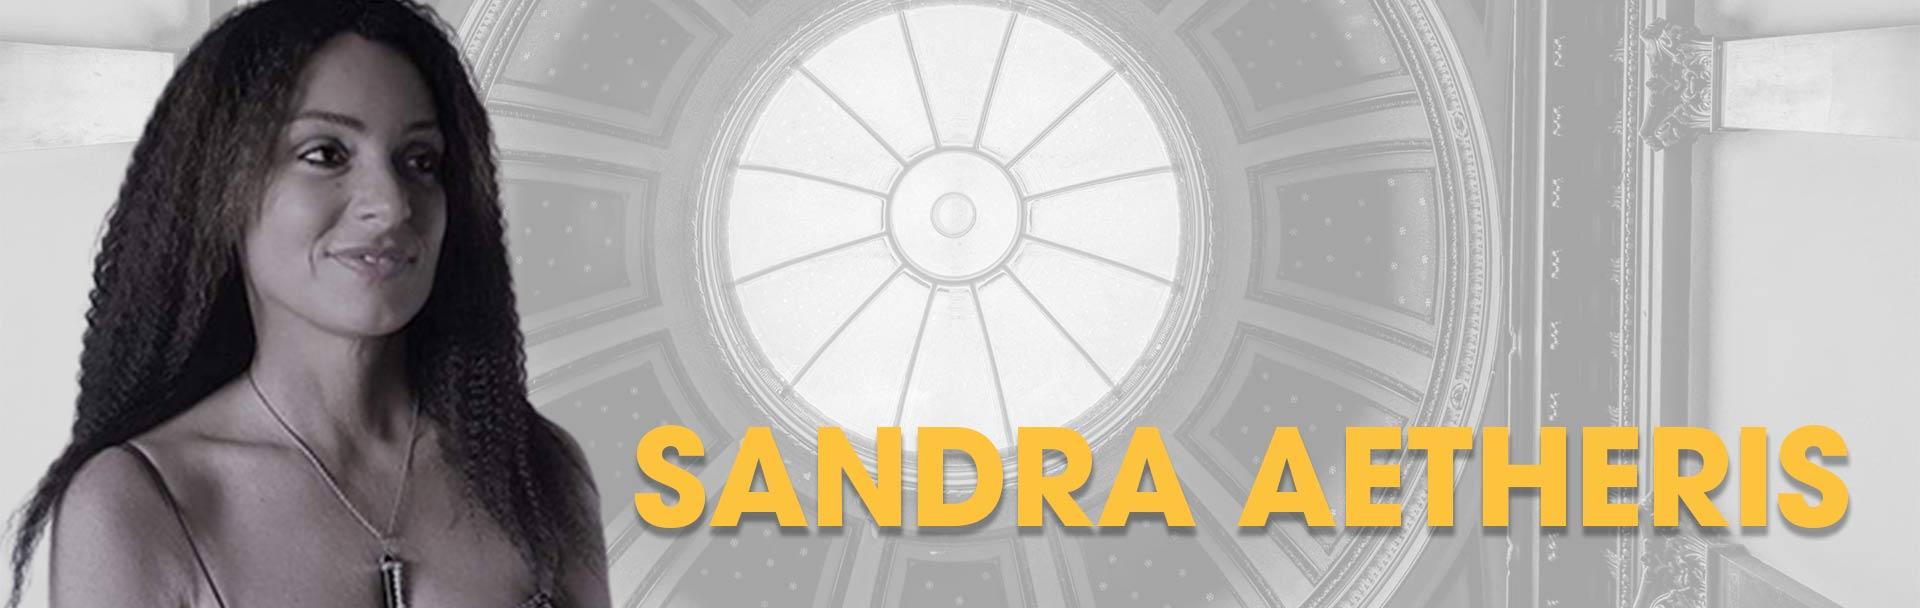 Sandra Aetheris is part of Saturday Night Demonstrations of Mediumship at the Sir Arthur Conan Doyle Centre